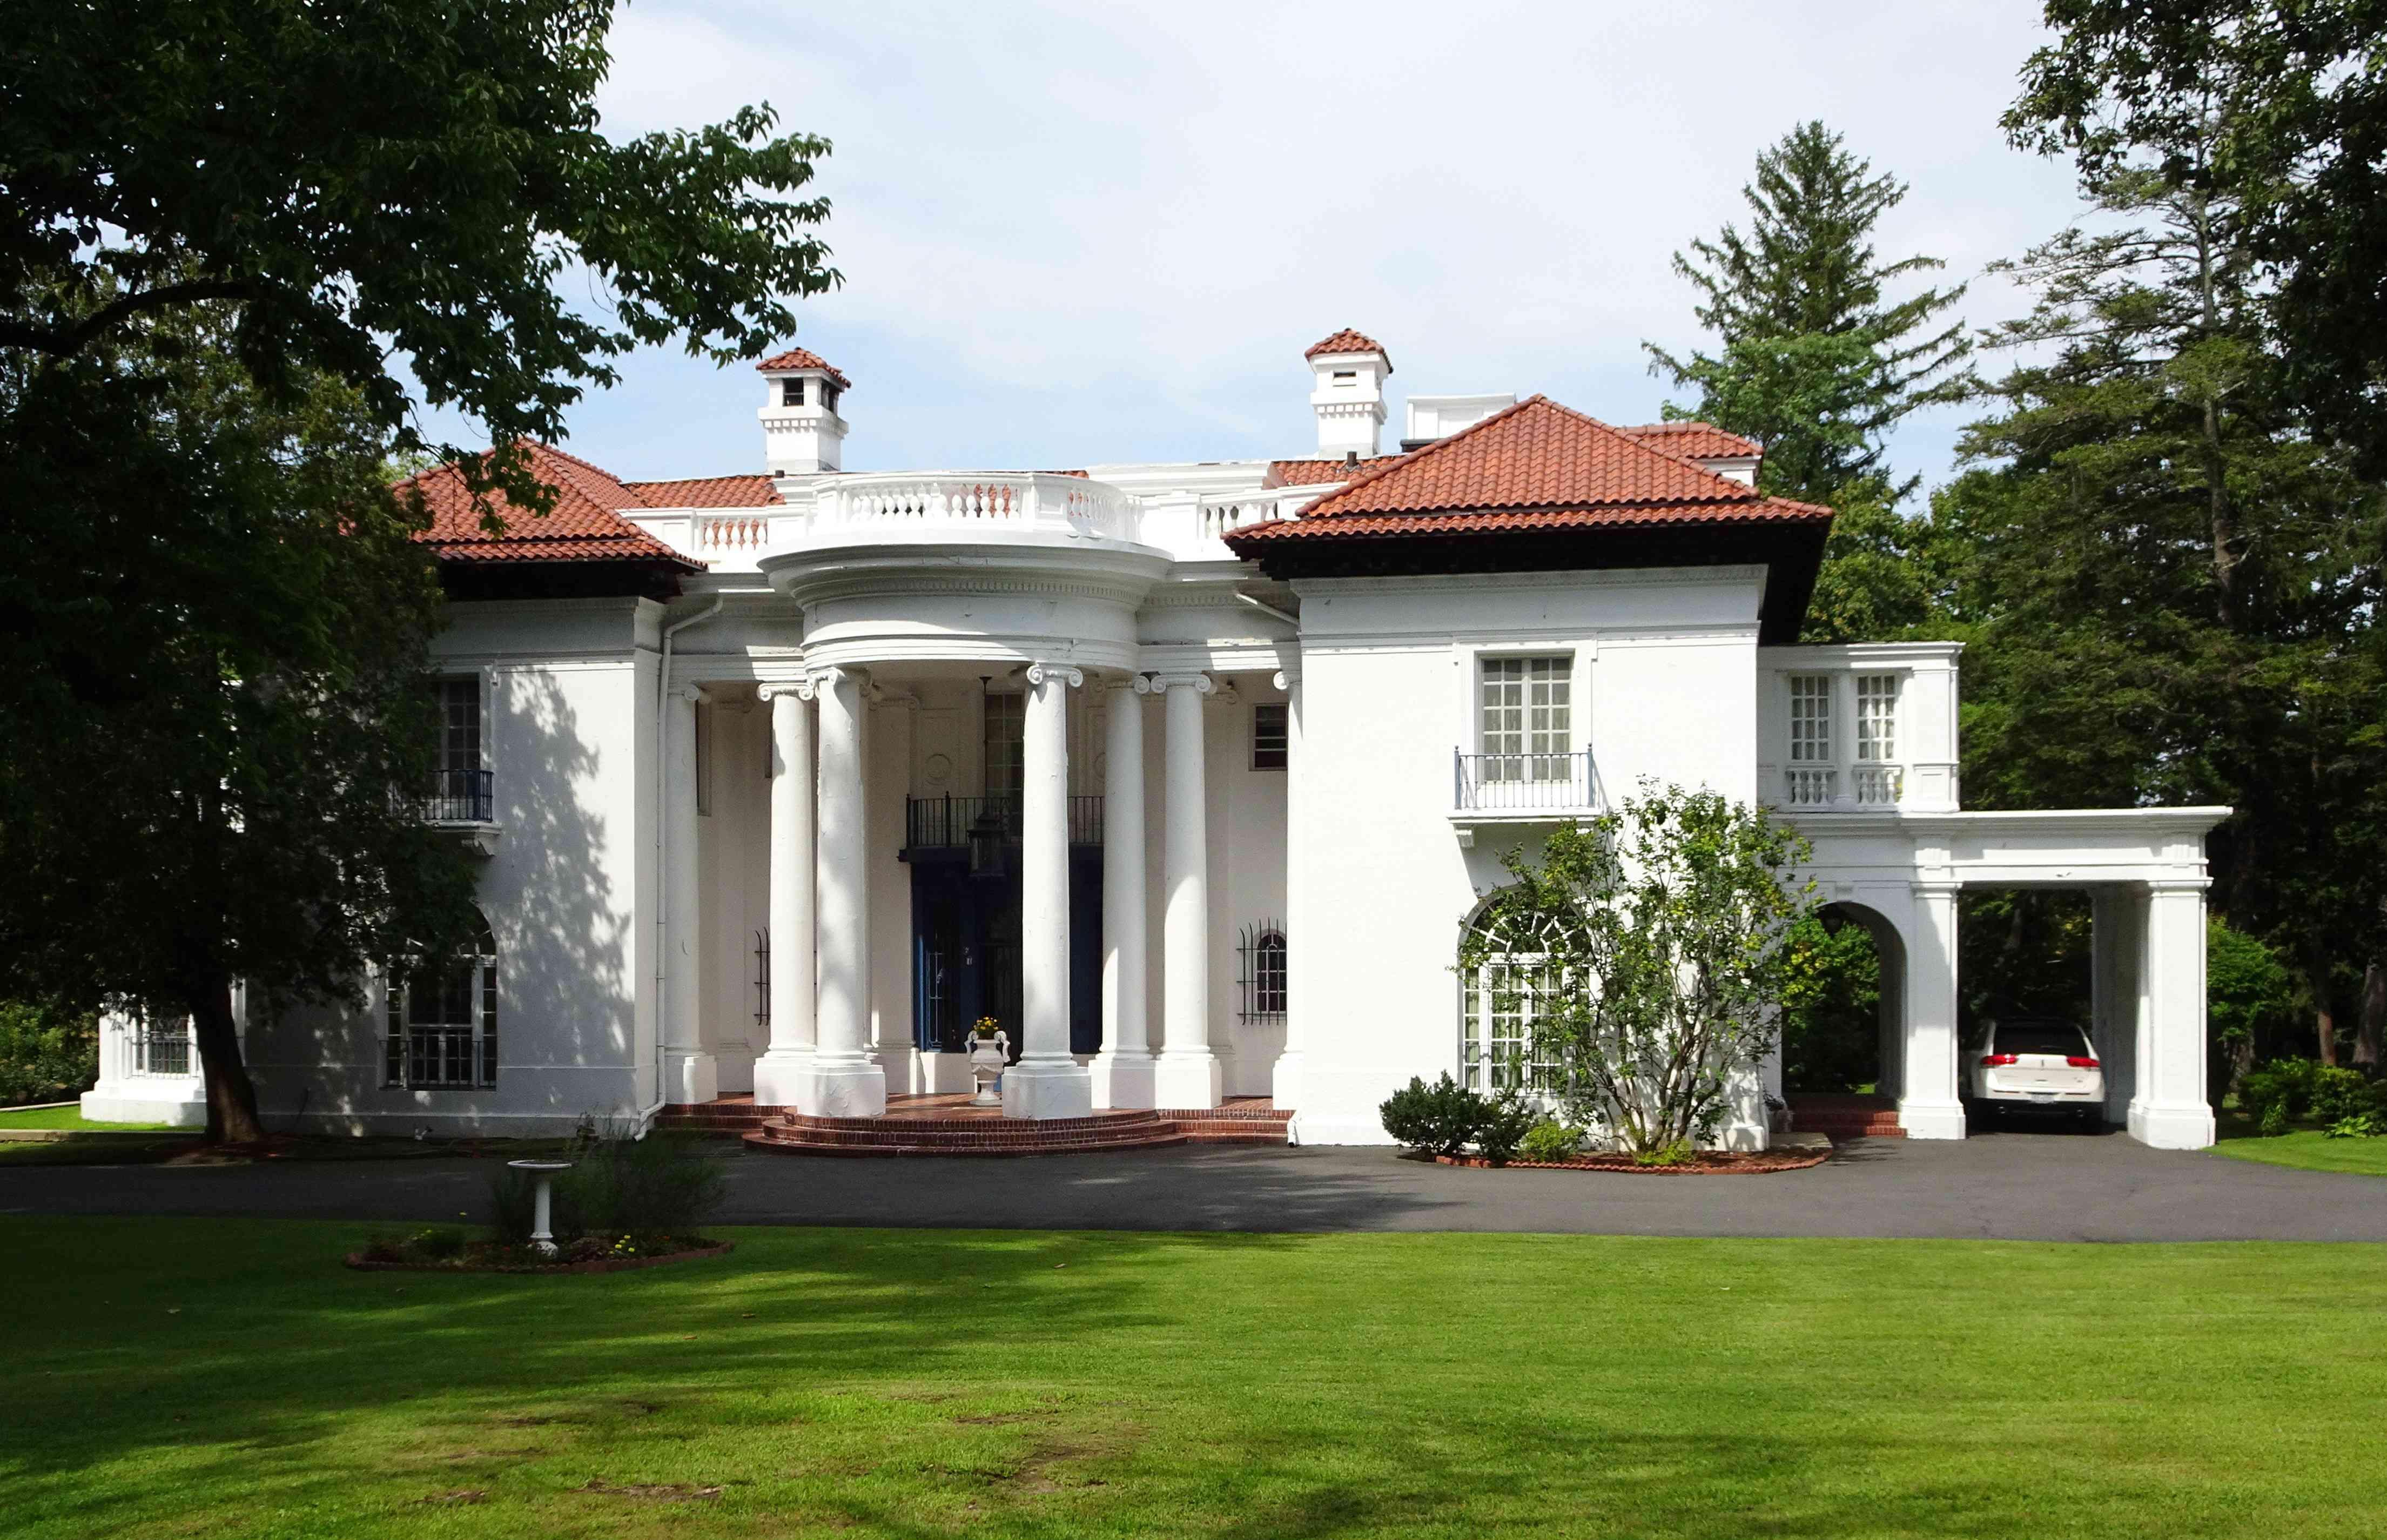 Photograph of Madam C.J. Walker's Villa Lewaro mansion in Irvington, New York, taken in 2016